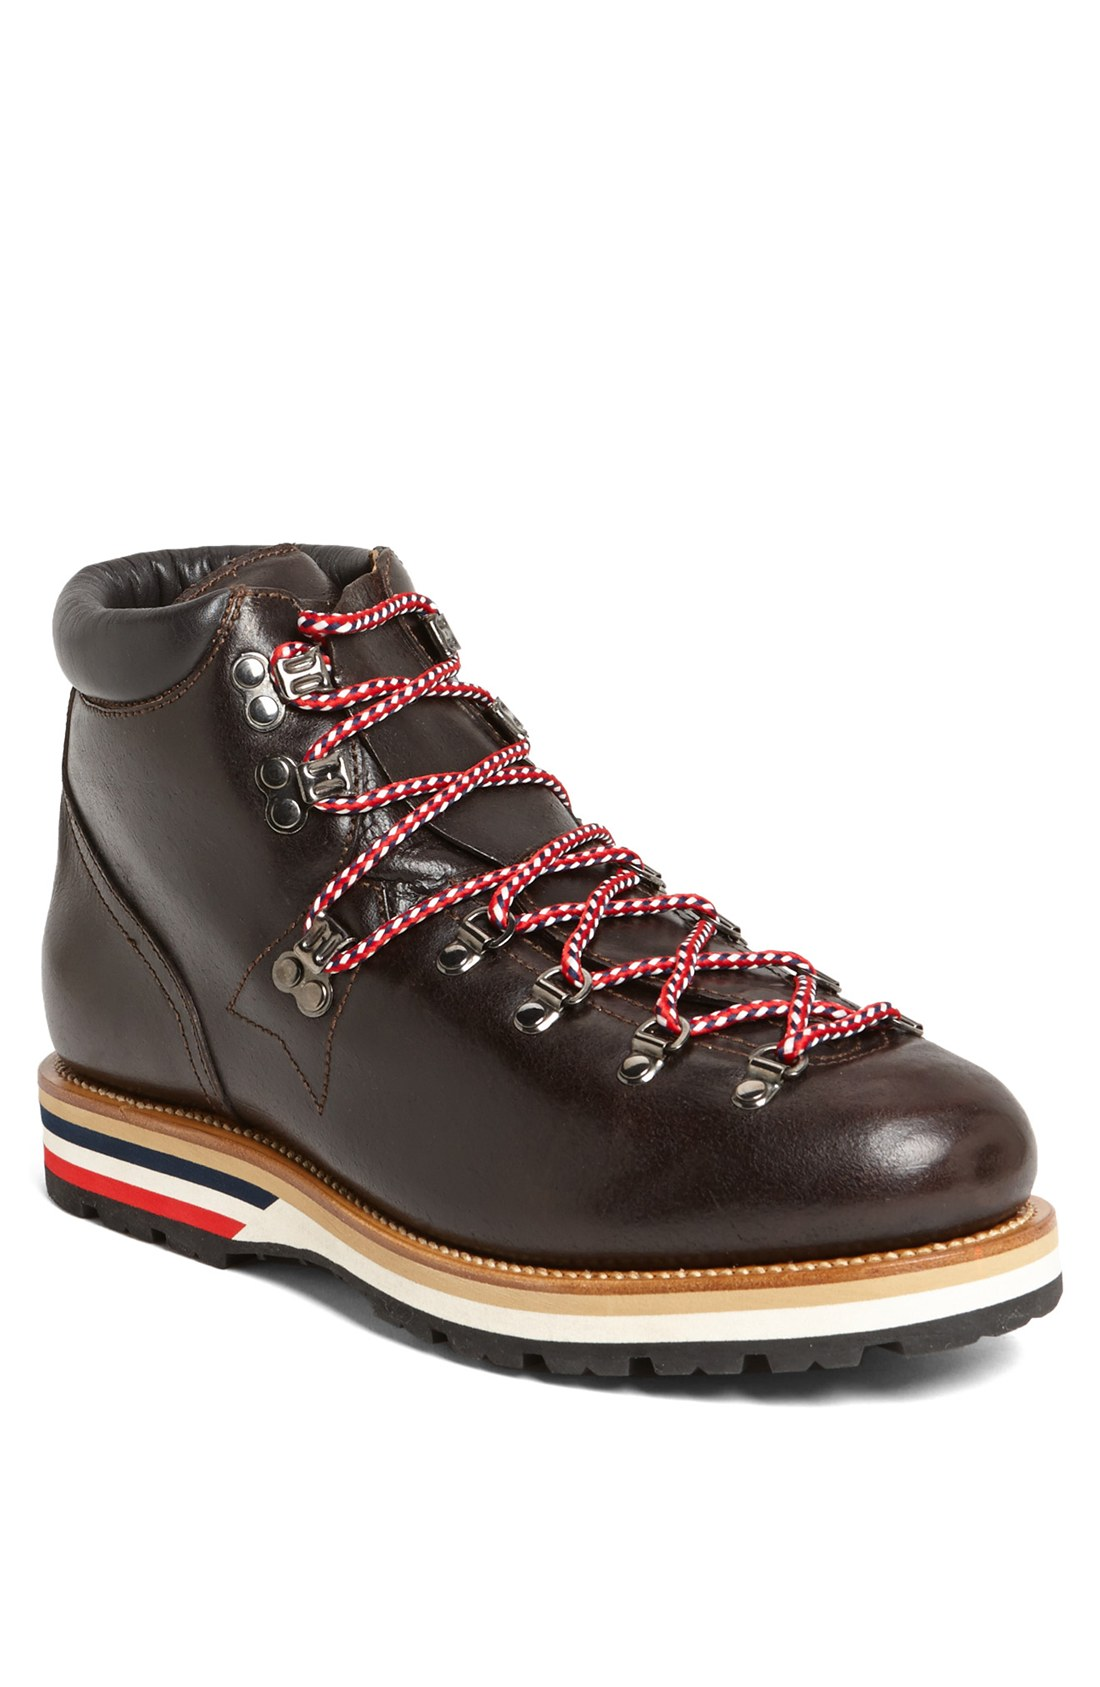 moncler matterhorn hiking boot in brown for